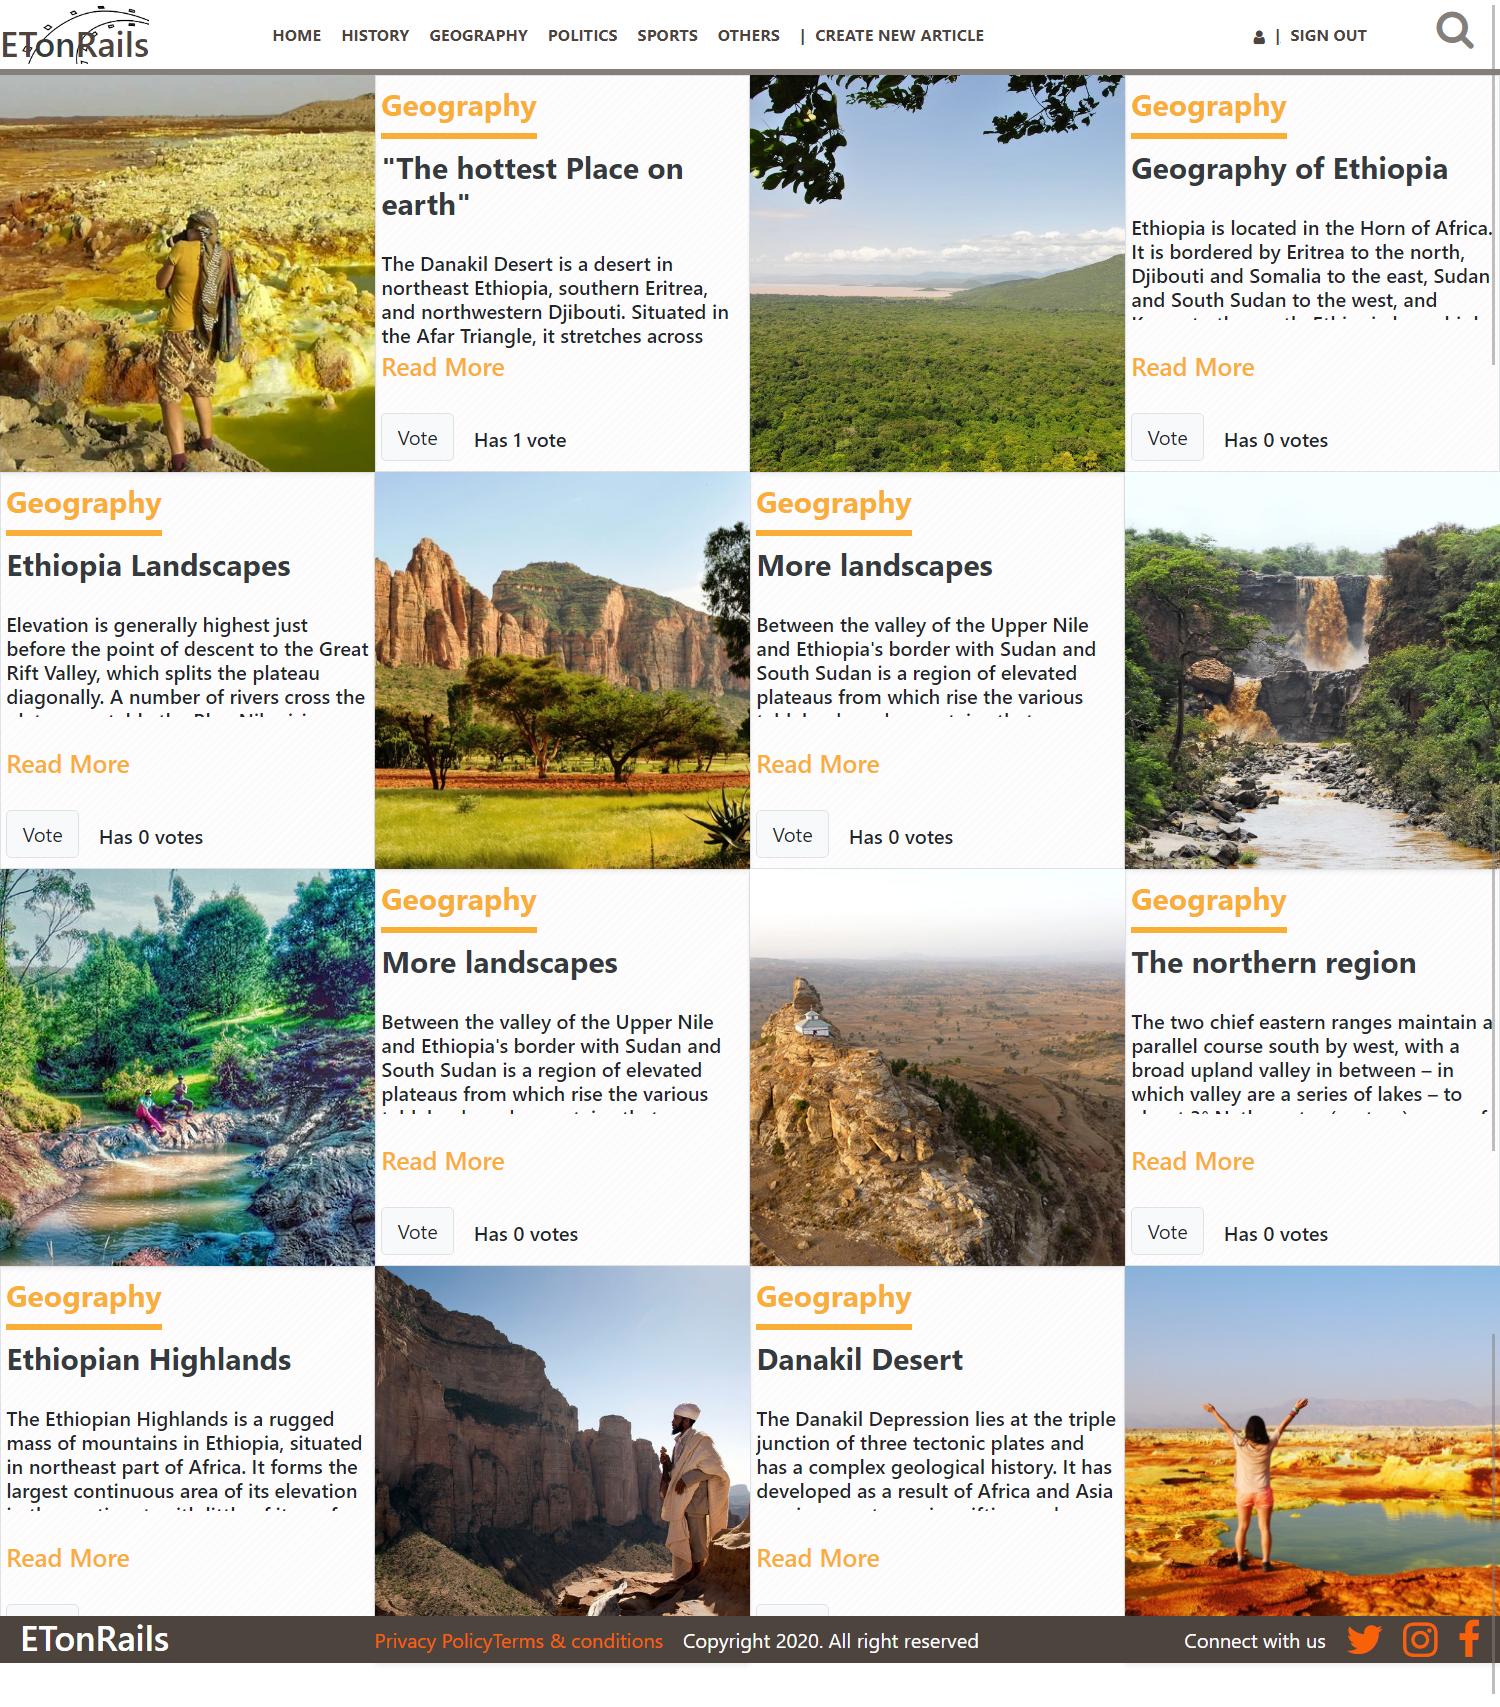 Ethiopia on Rails, Articles Web App About Ethiopia - 埃塞俄比亚铁路,文章关于埃塞俄比亚的网页应用程序